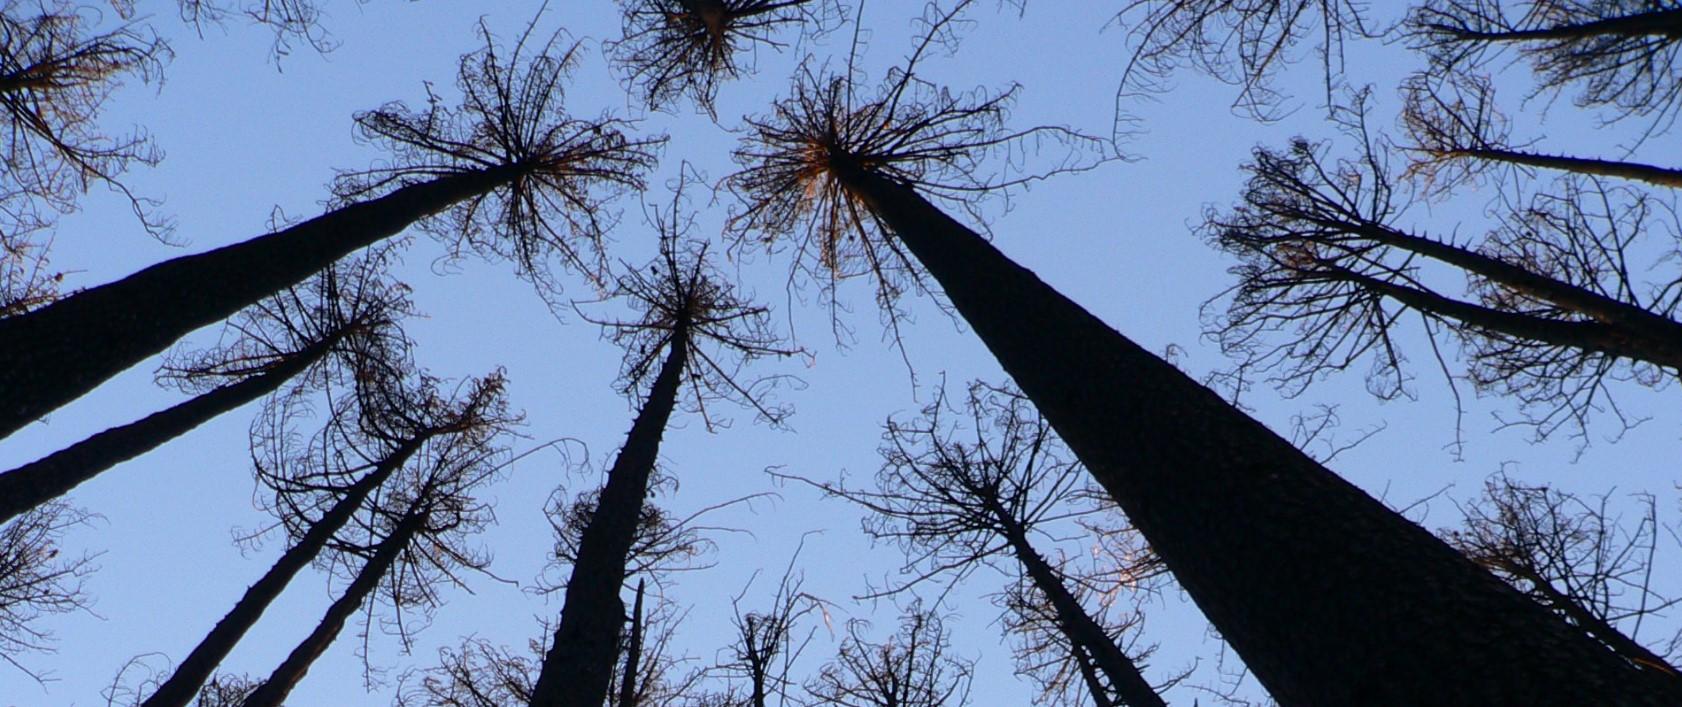 Sugar Pine Walk - looking up